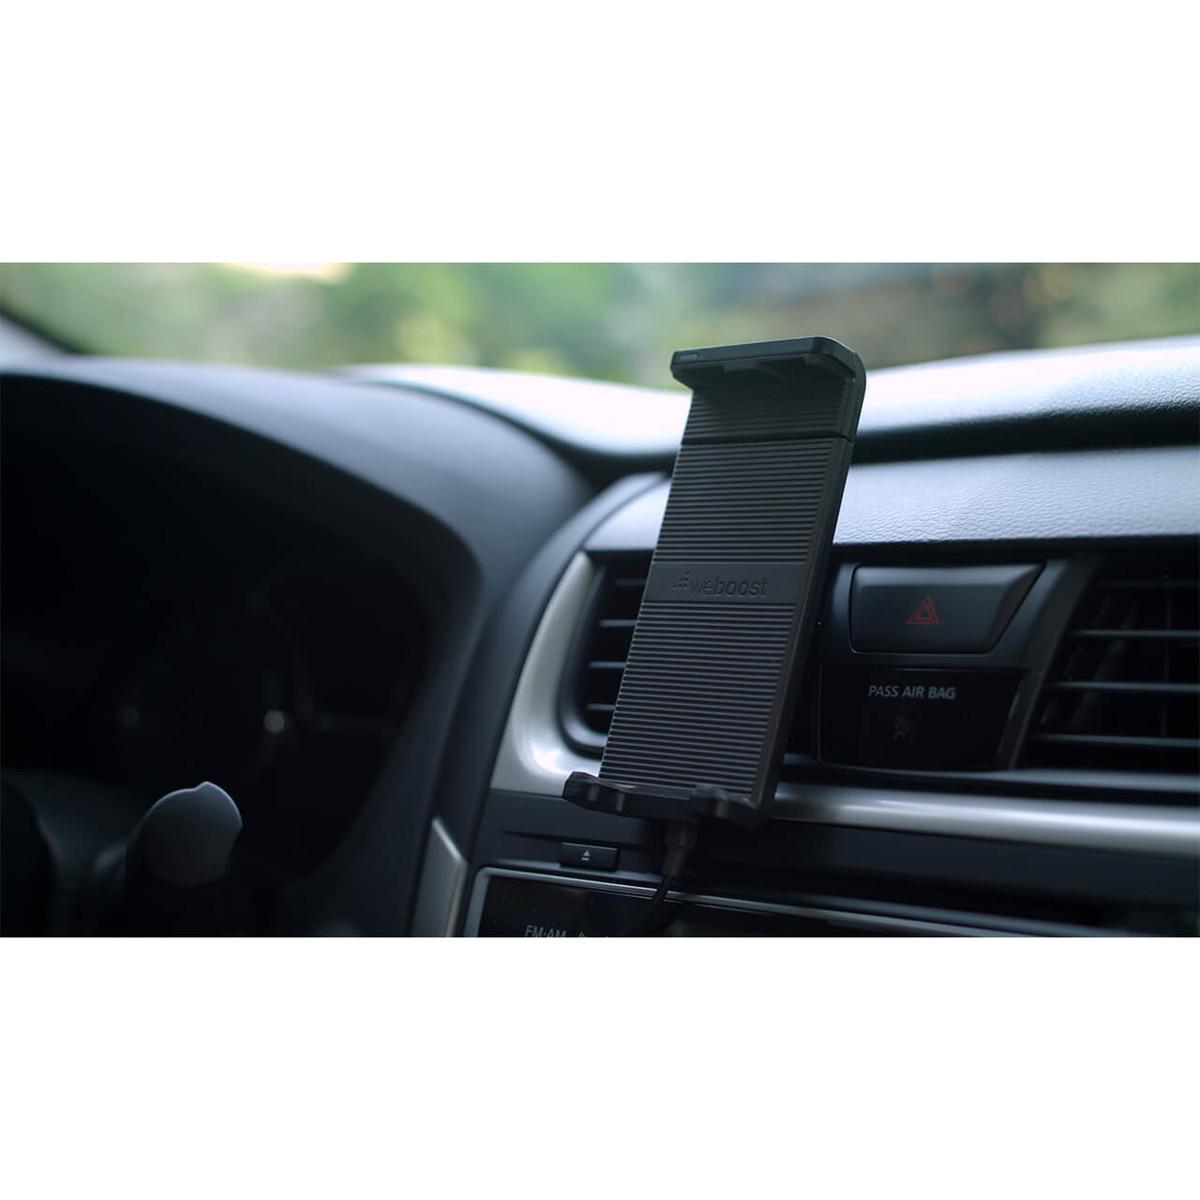 weBoost Drive Sleek OTR 4G Cell Phone Booster - lifestyle 02